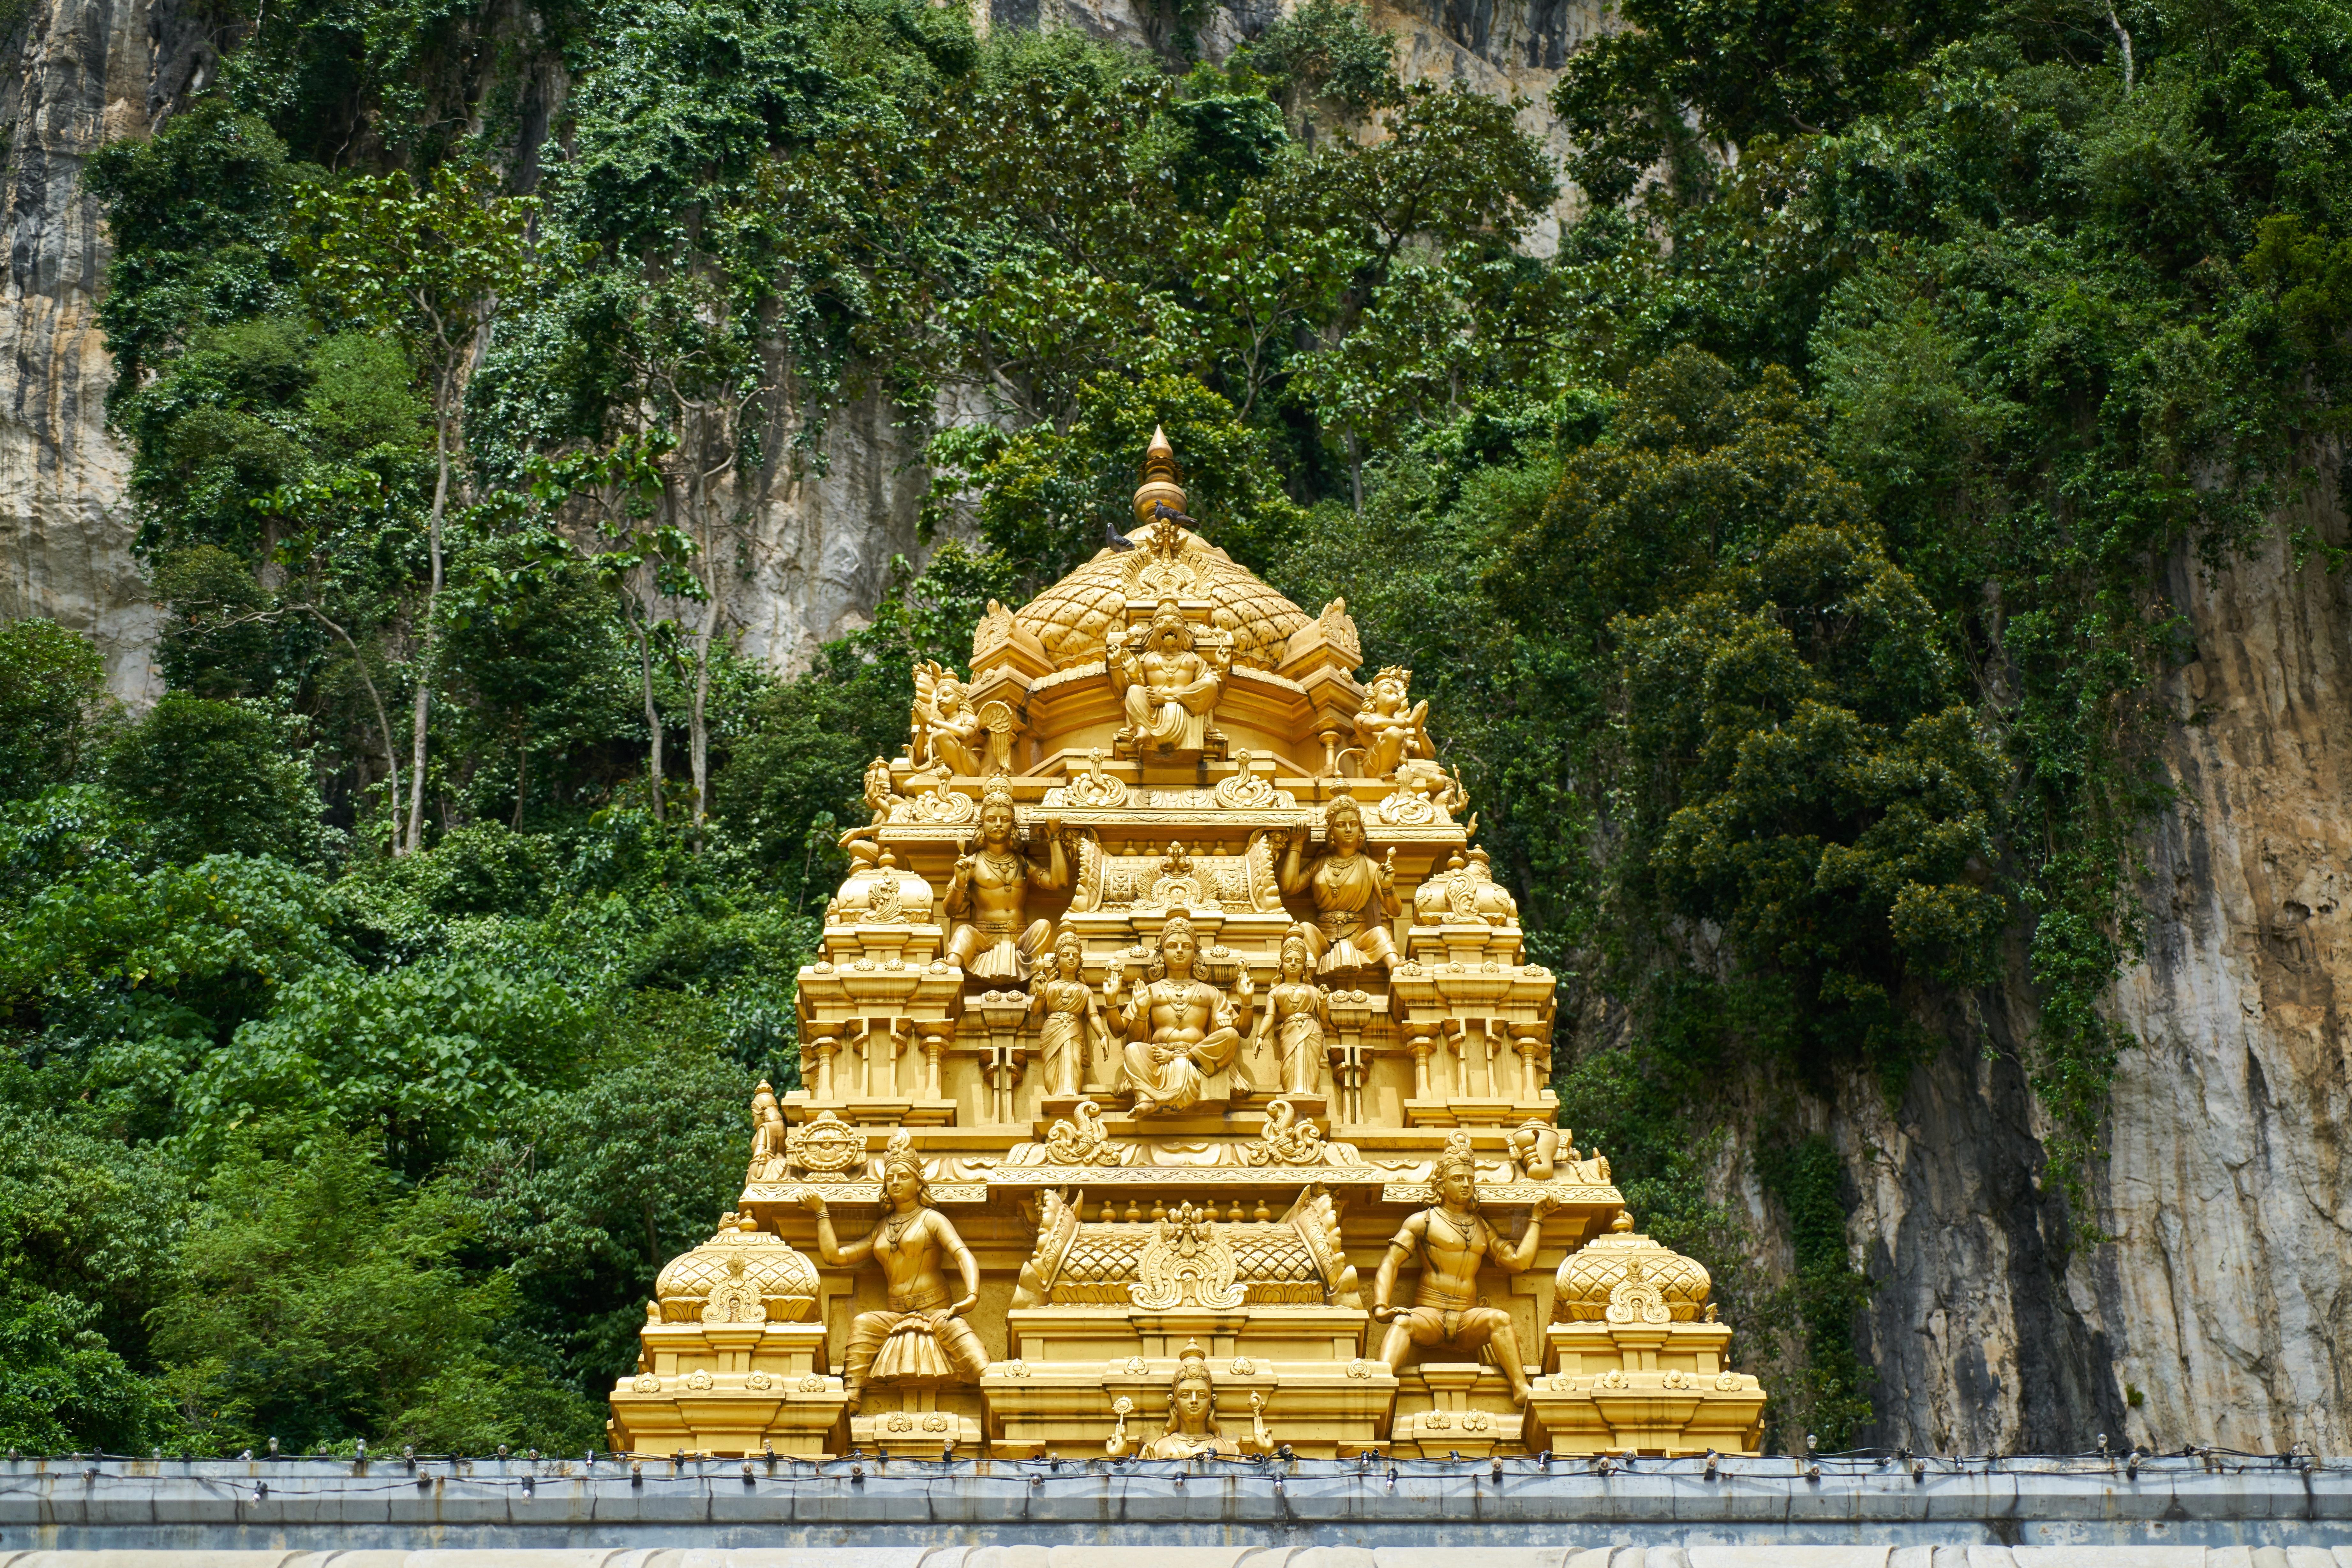 Gambar Perjalanan Asia Menara Buddha Agama Budha Kuning Tempat Beribadah Patung Emas Candi Di Iman Kamboja Kuil Doa Besar Hari Menyembah Allah Klenteng Wat Estetika Hinduisme Kota Tua Situs Arkeologi Kota